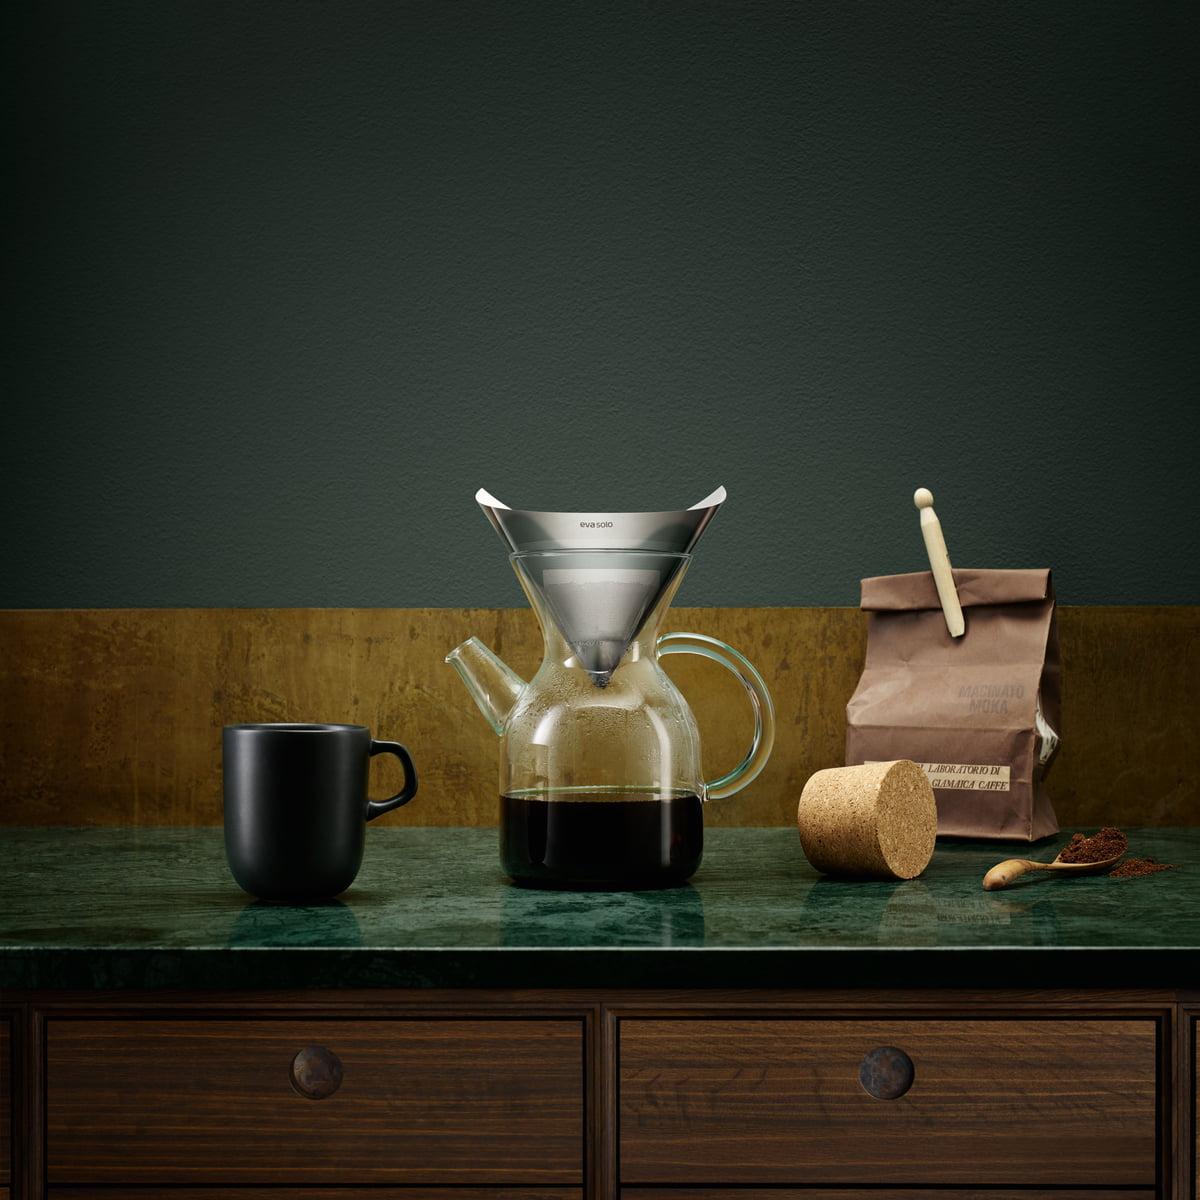 pour over kaffeebereiter von eva solo kaufen. Black Bedroom Furniture Sets. Home Design Ideas